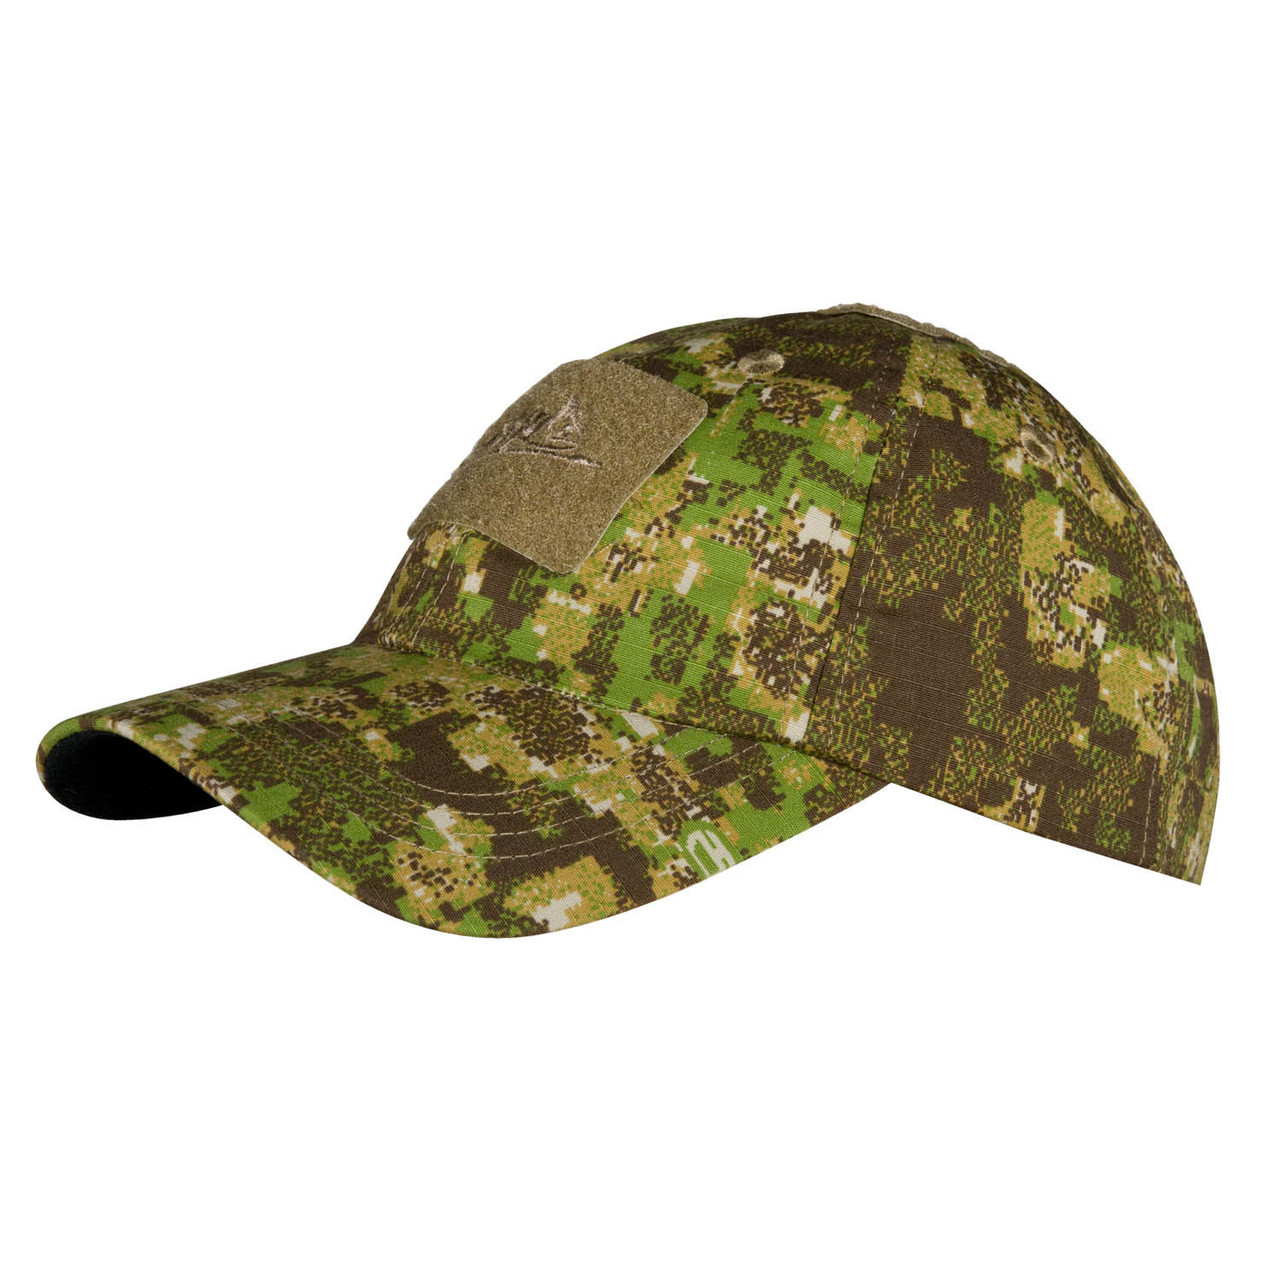 Тактическая бейсболка Helikon-Tex® Tactical Baseball Cap NR - PenCott™ GreenZone